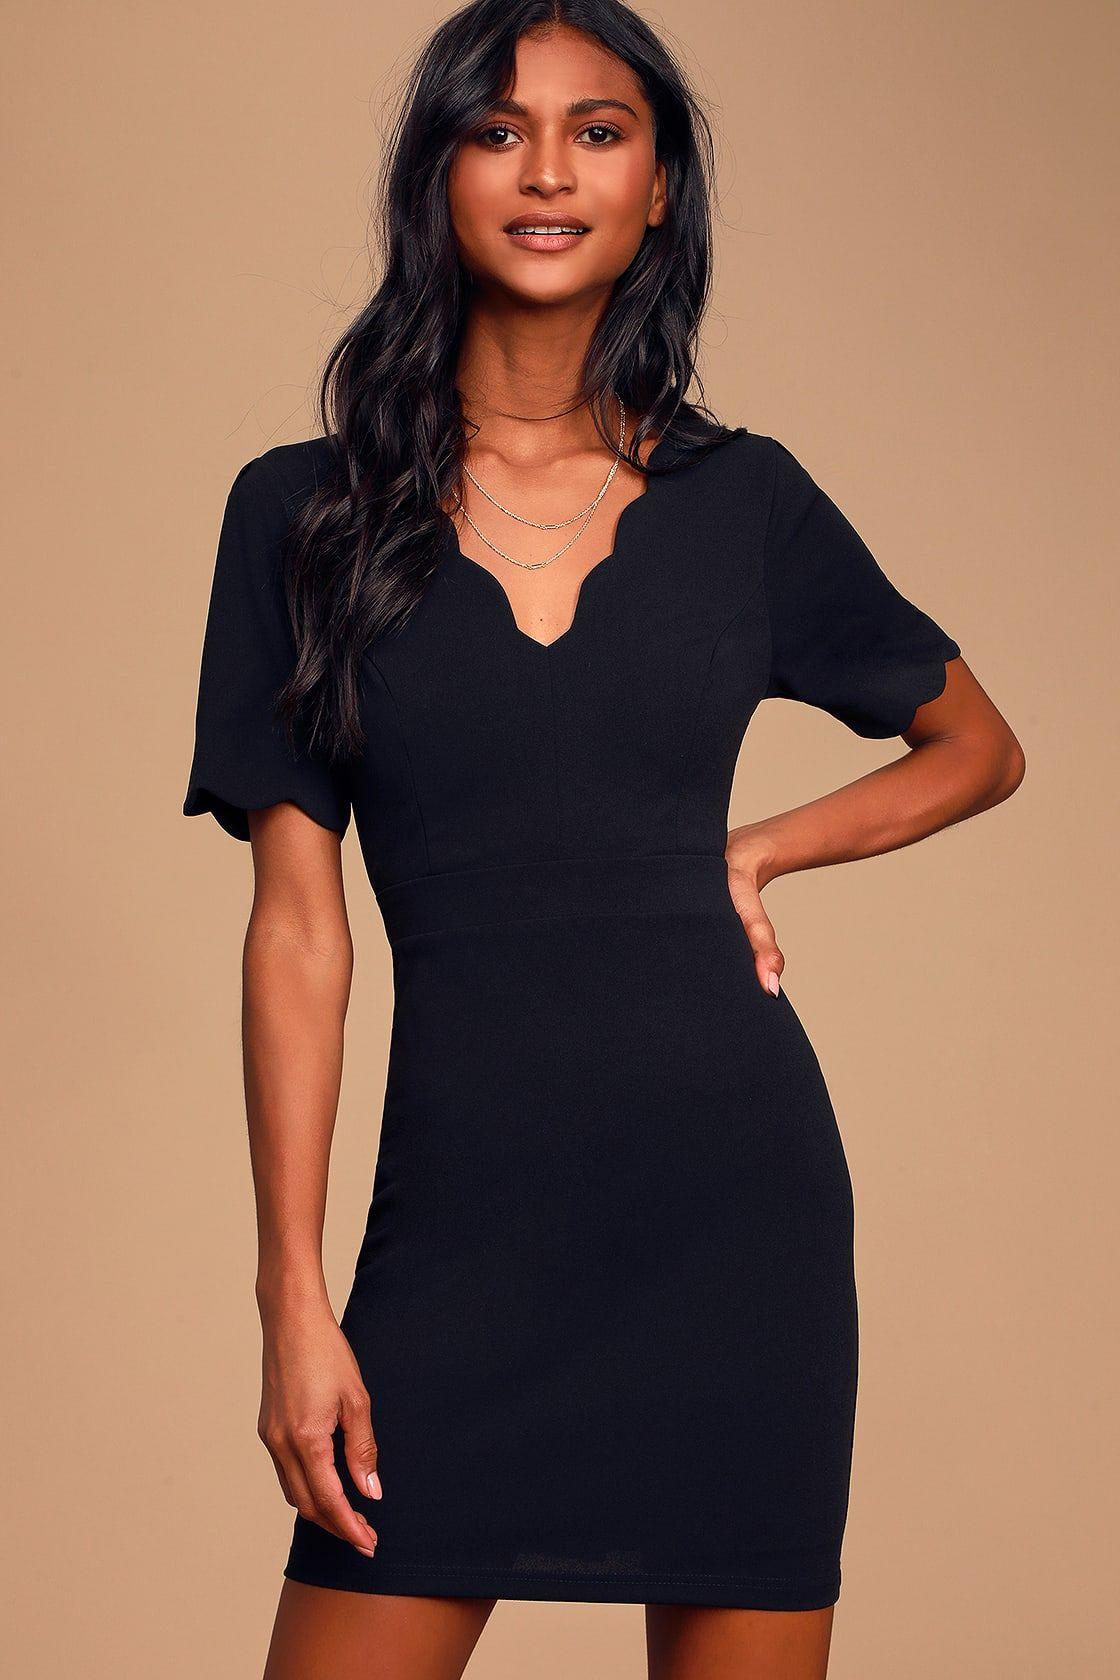 Shopping black bodycon dress short sleeve scalloped women juniors